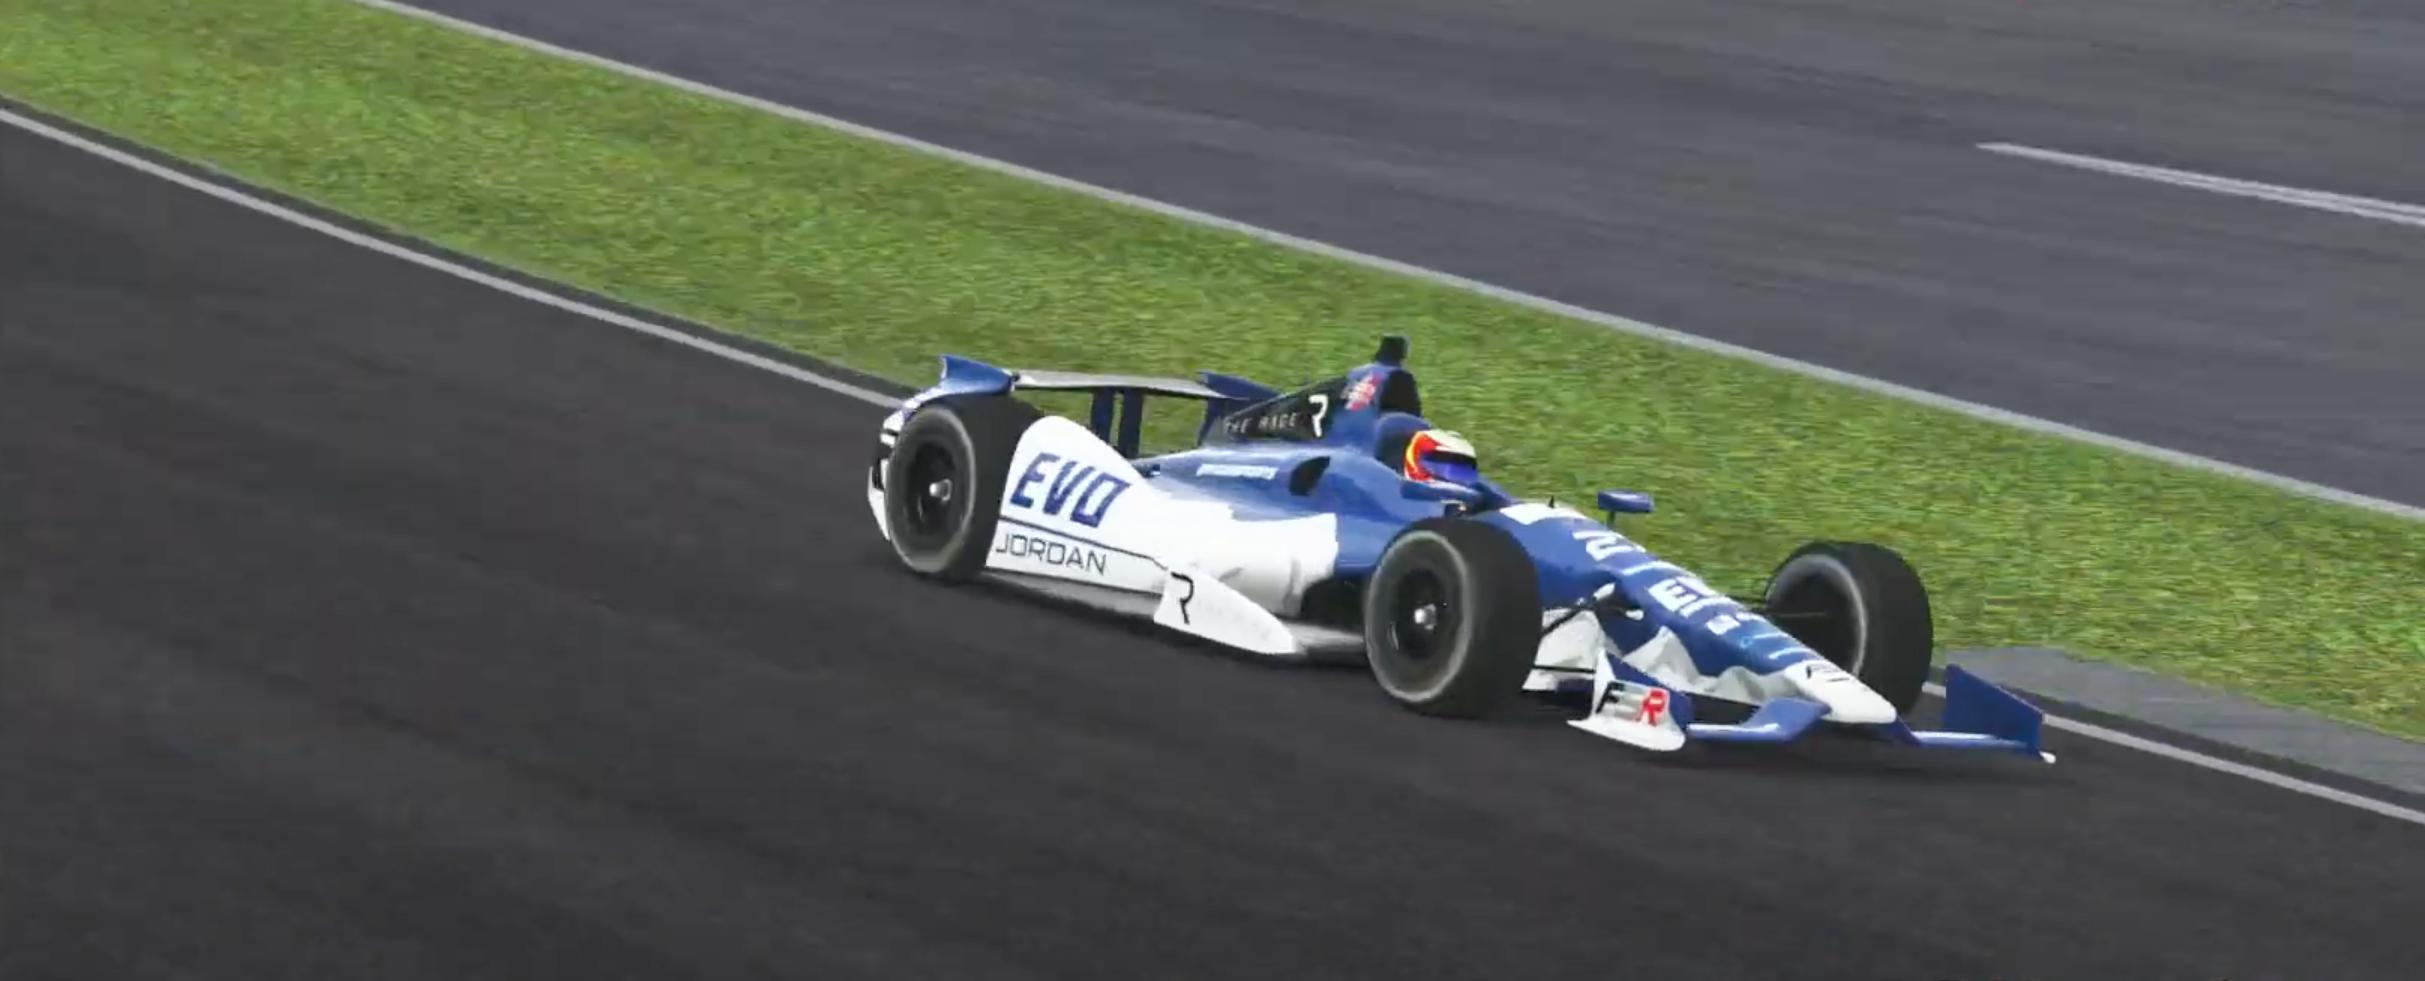 Indypro R6 Jordan